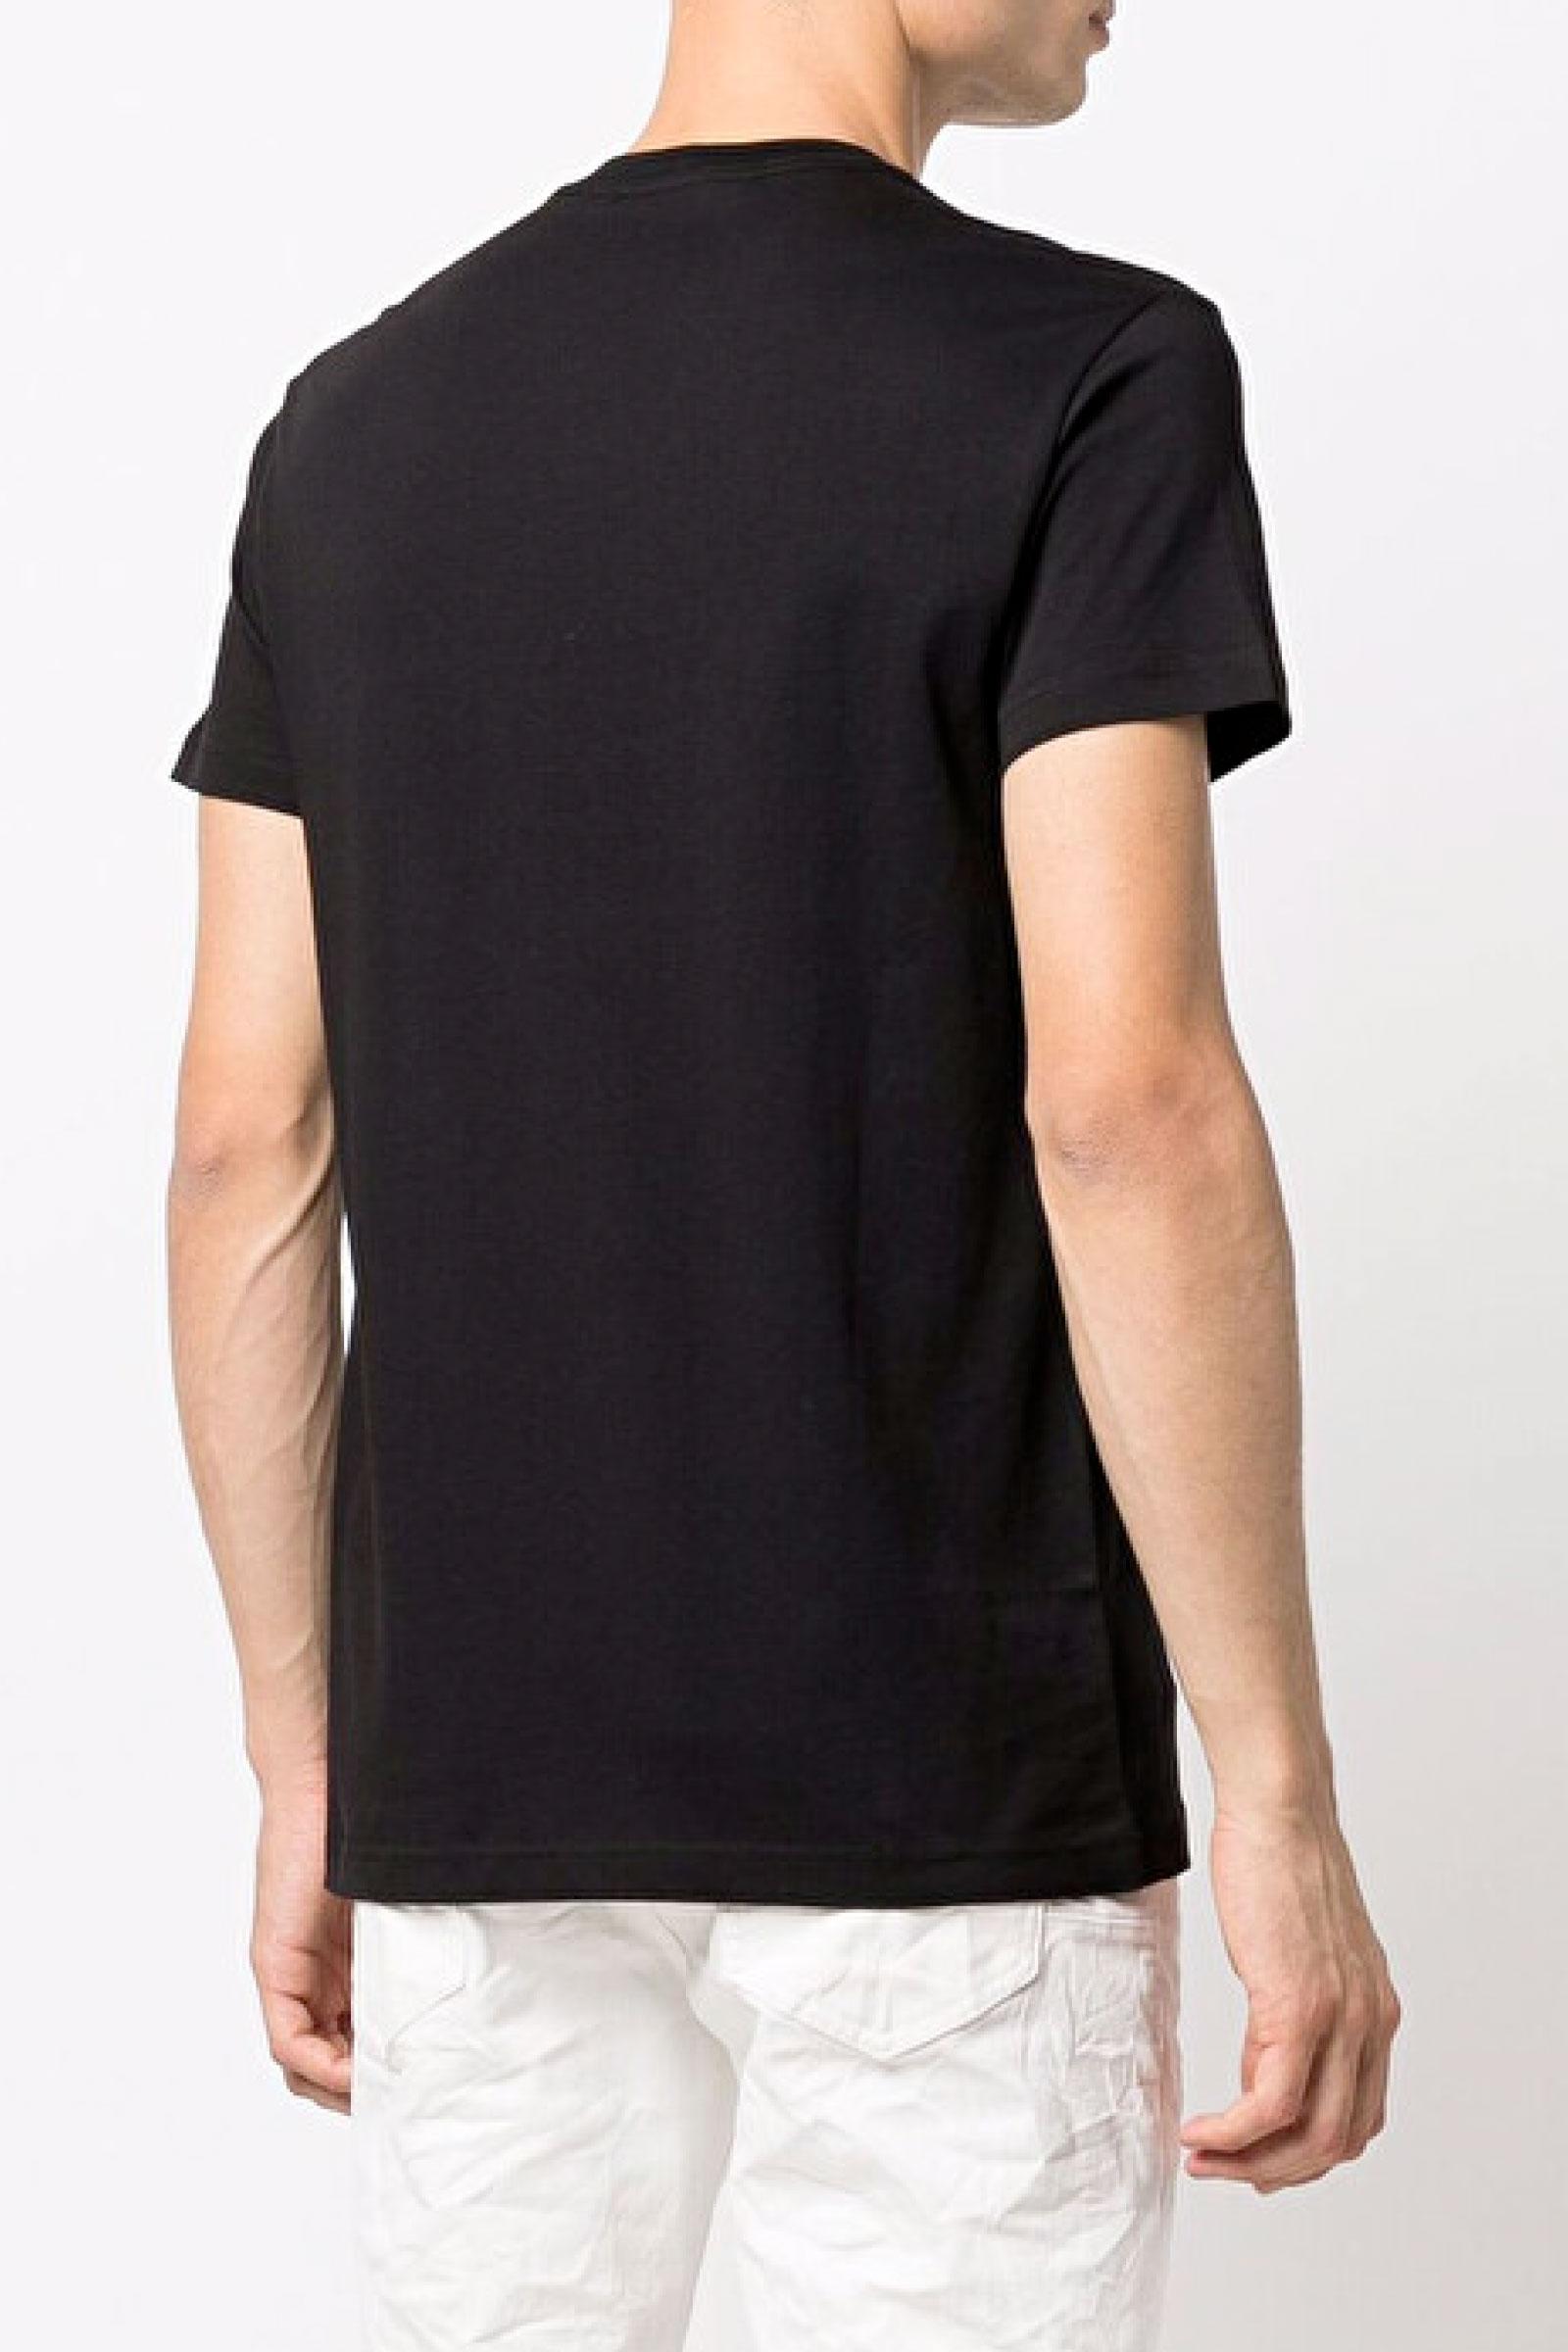 VERSACE JEANS COUTURE | T-Shirt | 71GAHT04 CJ00TG89